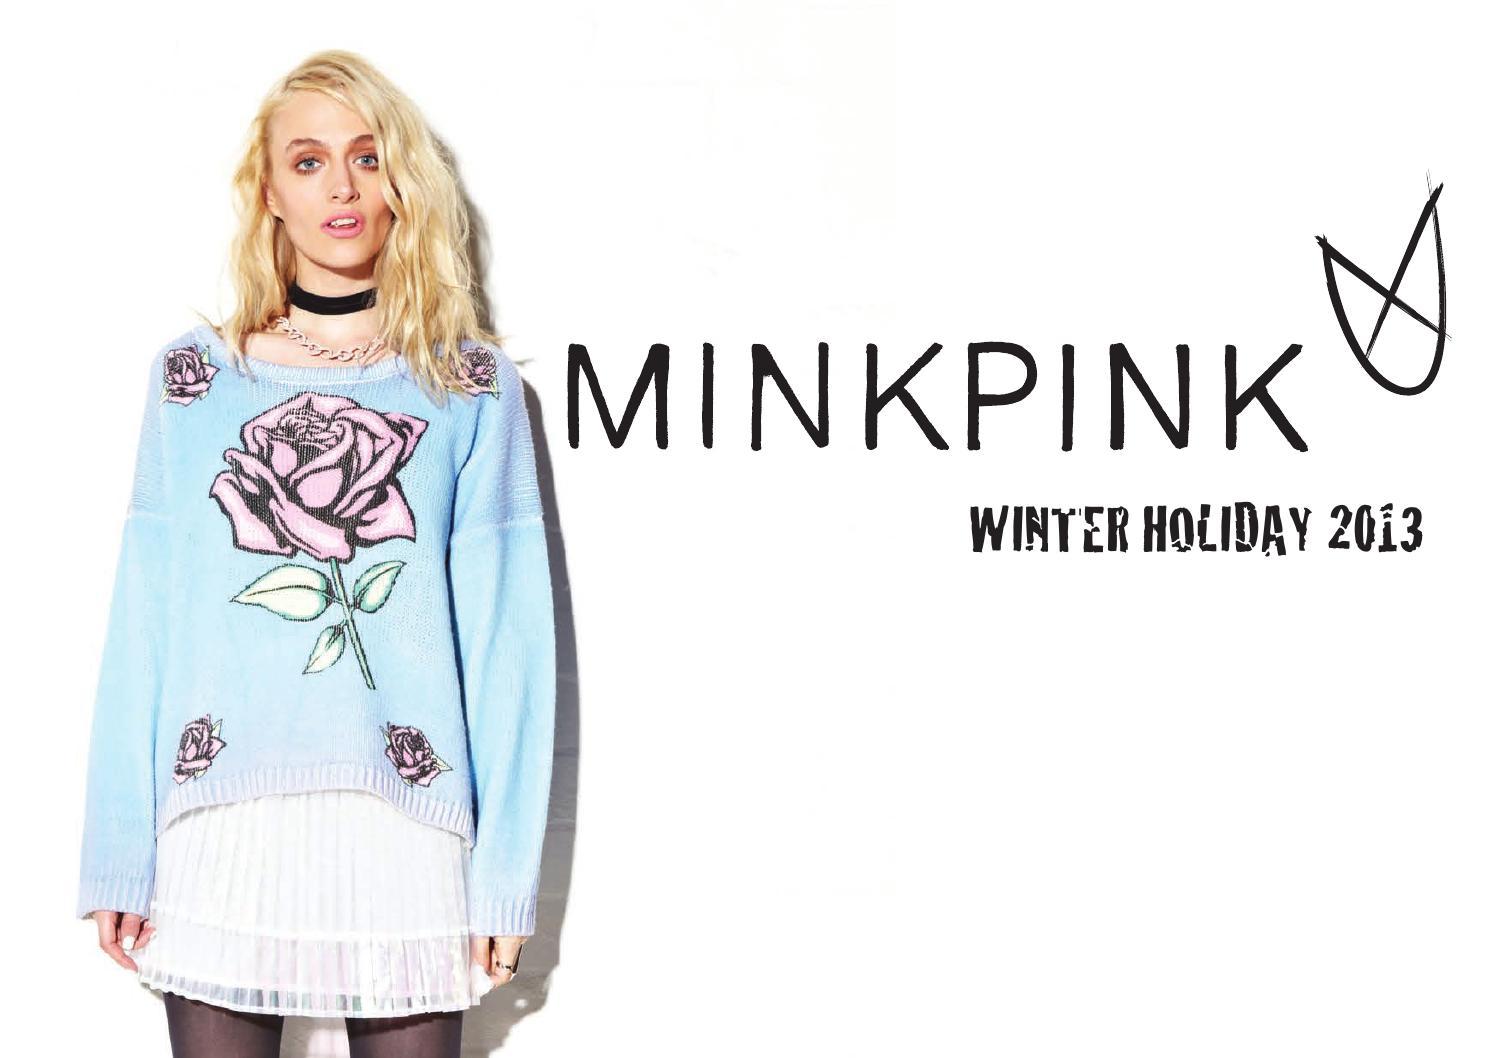 052b02397fa Minkpink Winter Holiday 2013 Lookbook by Zappos.com - issuu